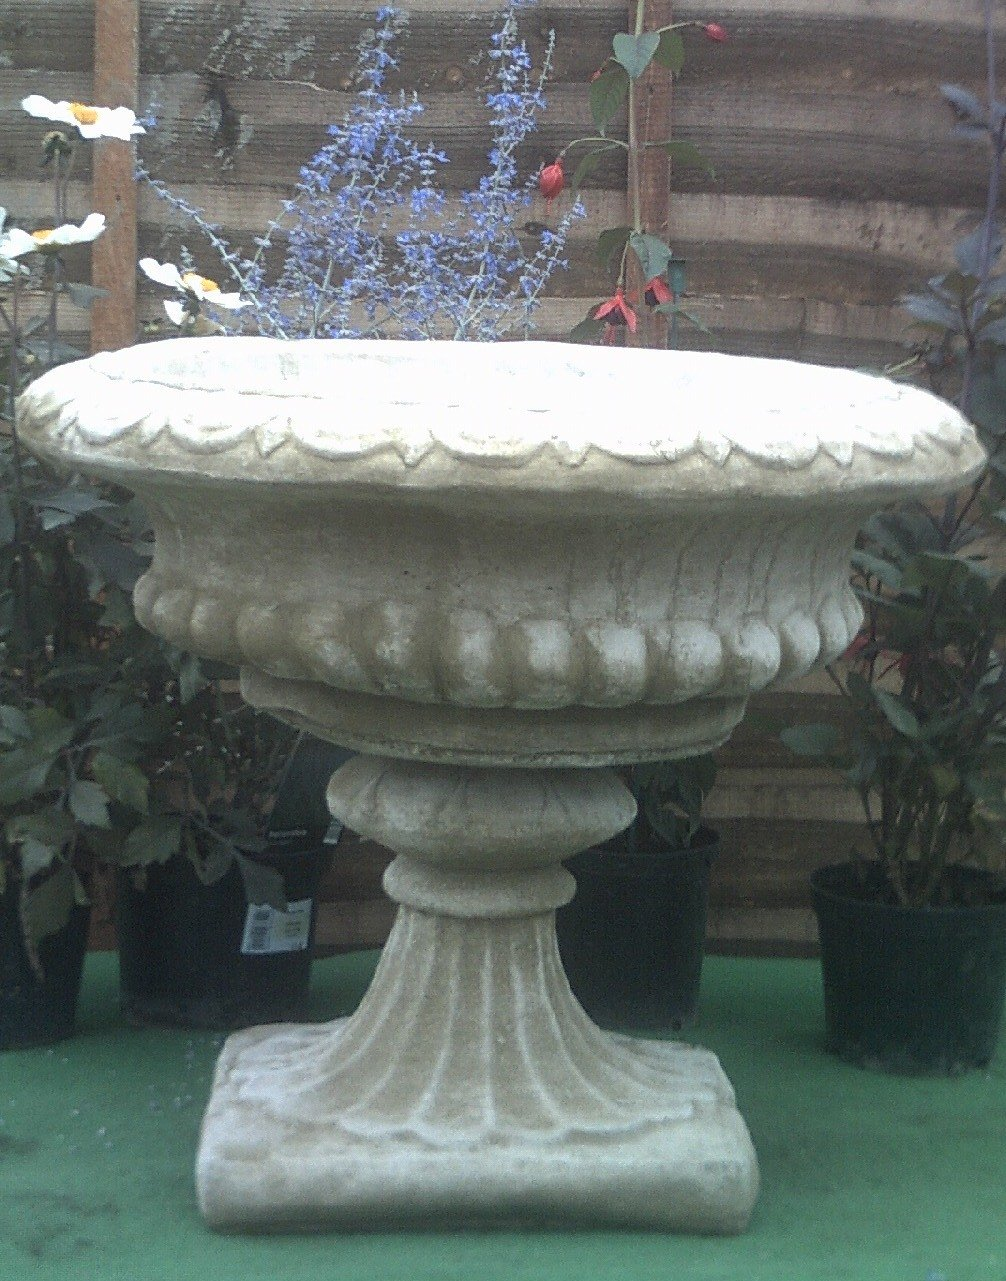 Stone Concrete Victorian Vase Planter.